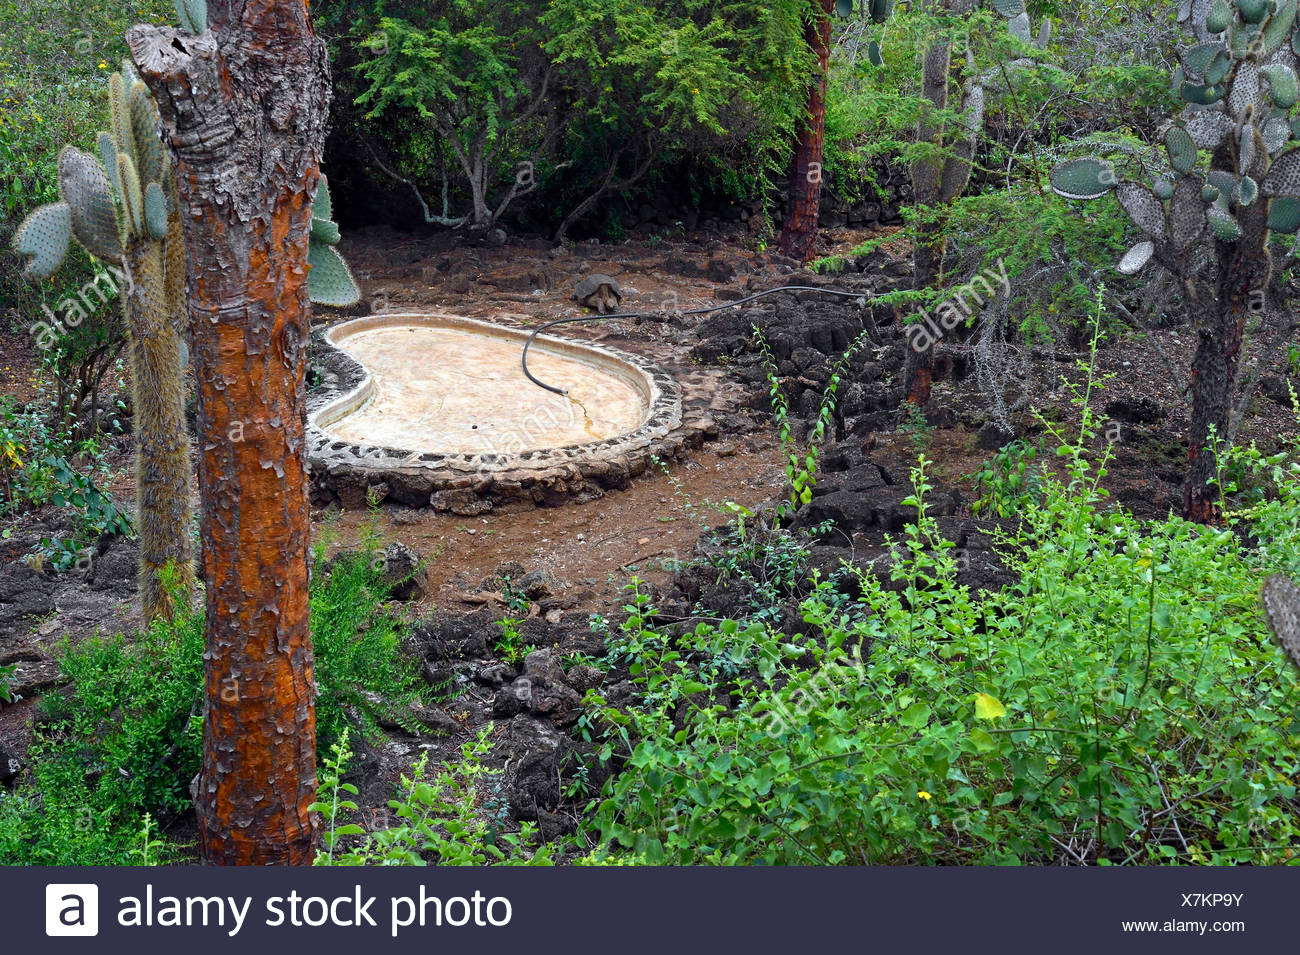 Pinta-Riesenschildkroete, Pintariesenschildkroete, Pinta-Galapagosschildkroete, Pintagalapagosschildkroete (Chelonodis nigra abi - Stock Image